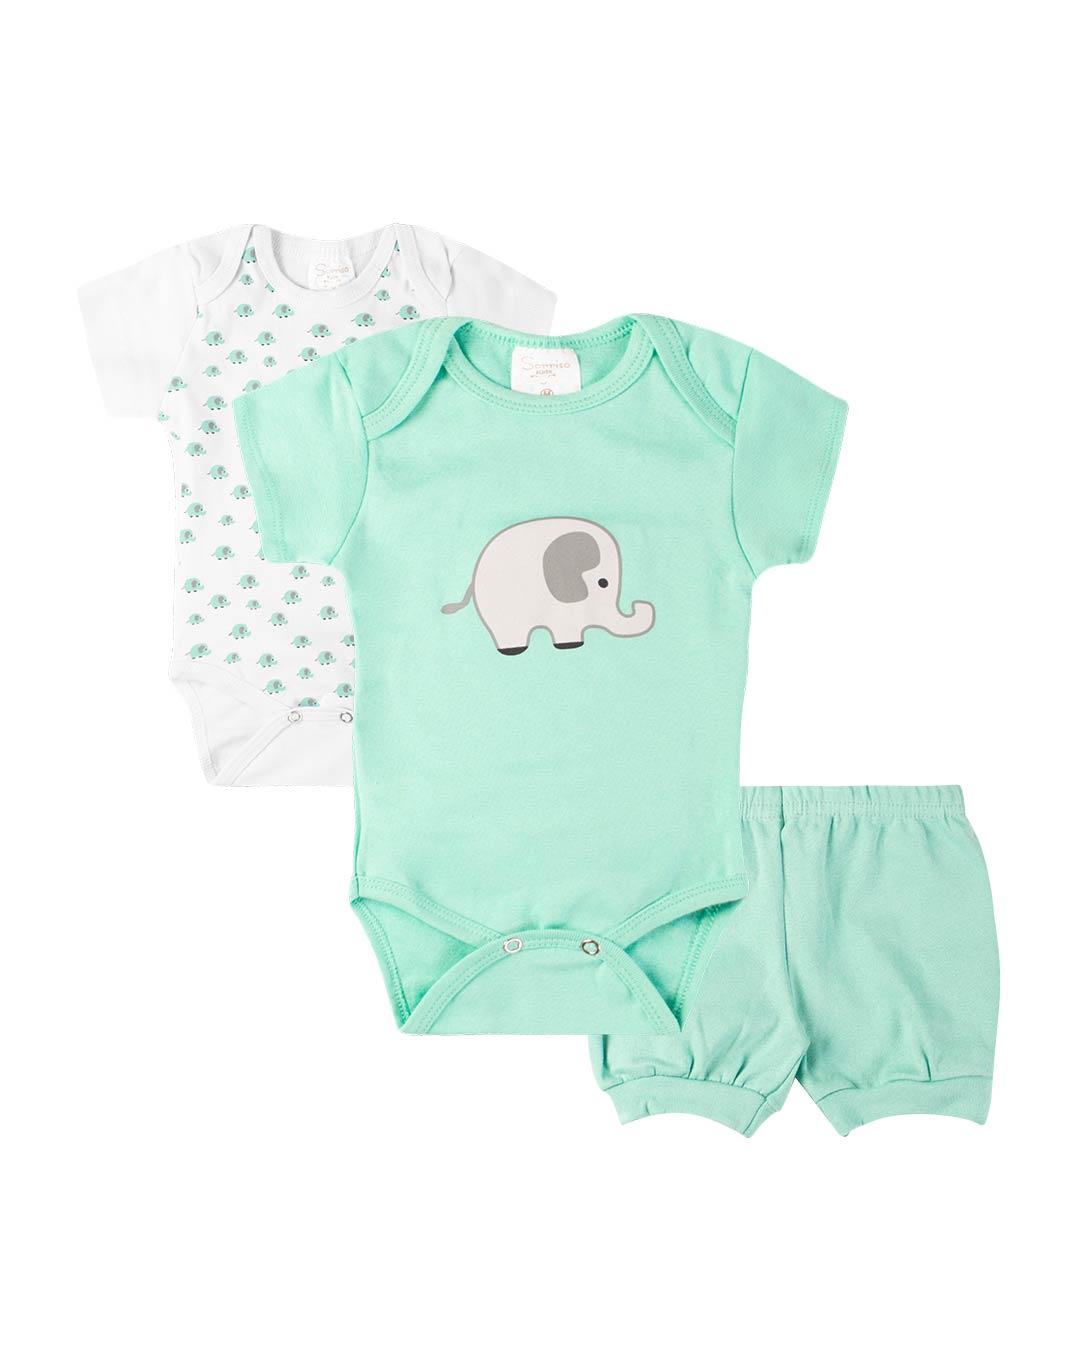 Kit Body 3 Peças com Bermuda Elefantinho Branca - Sorriso Kids